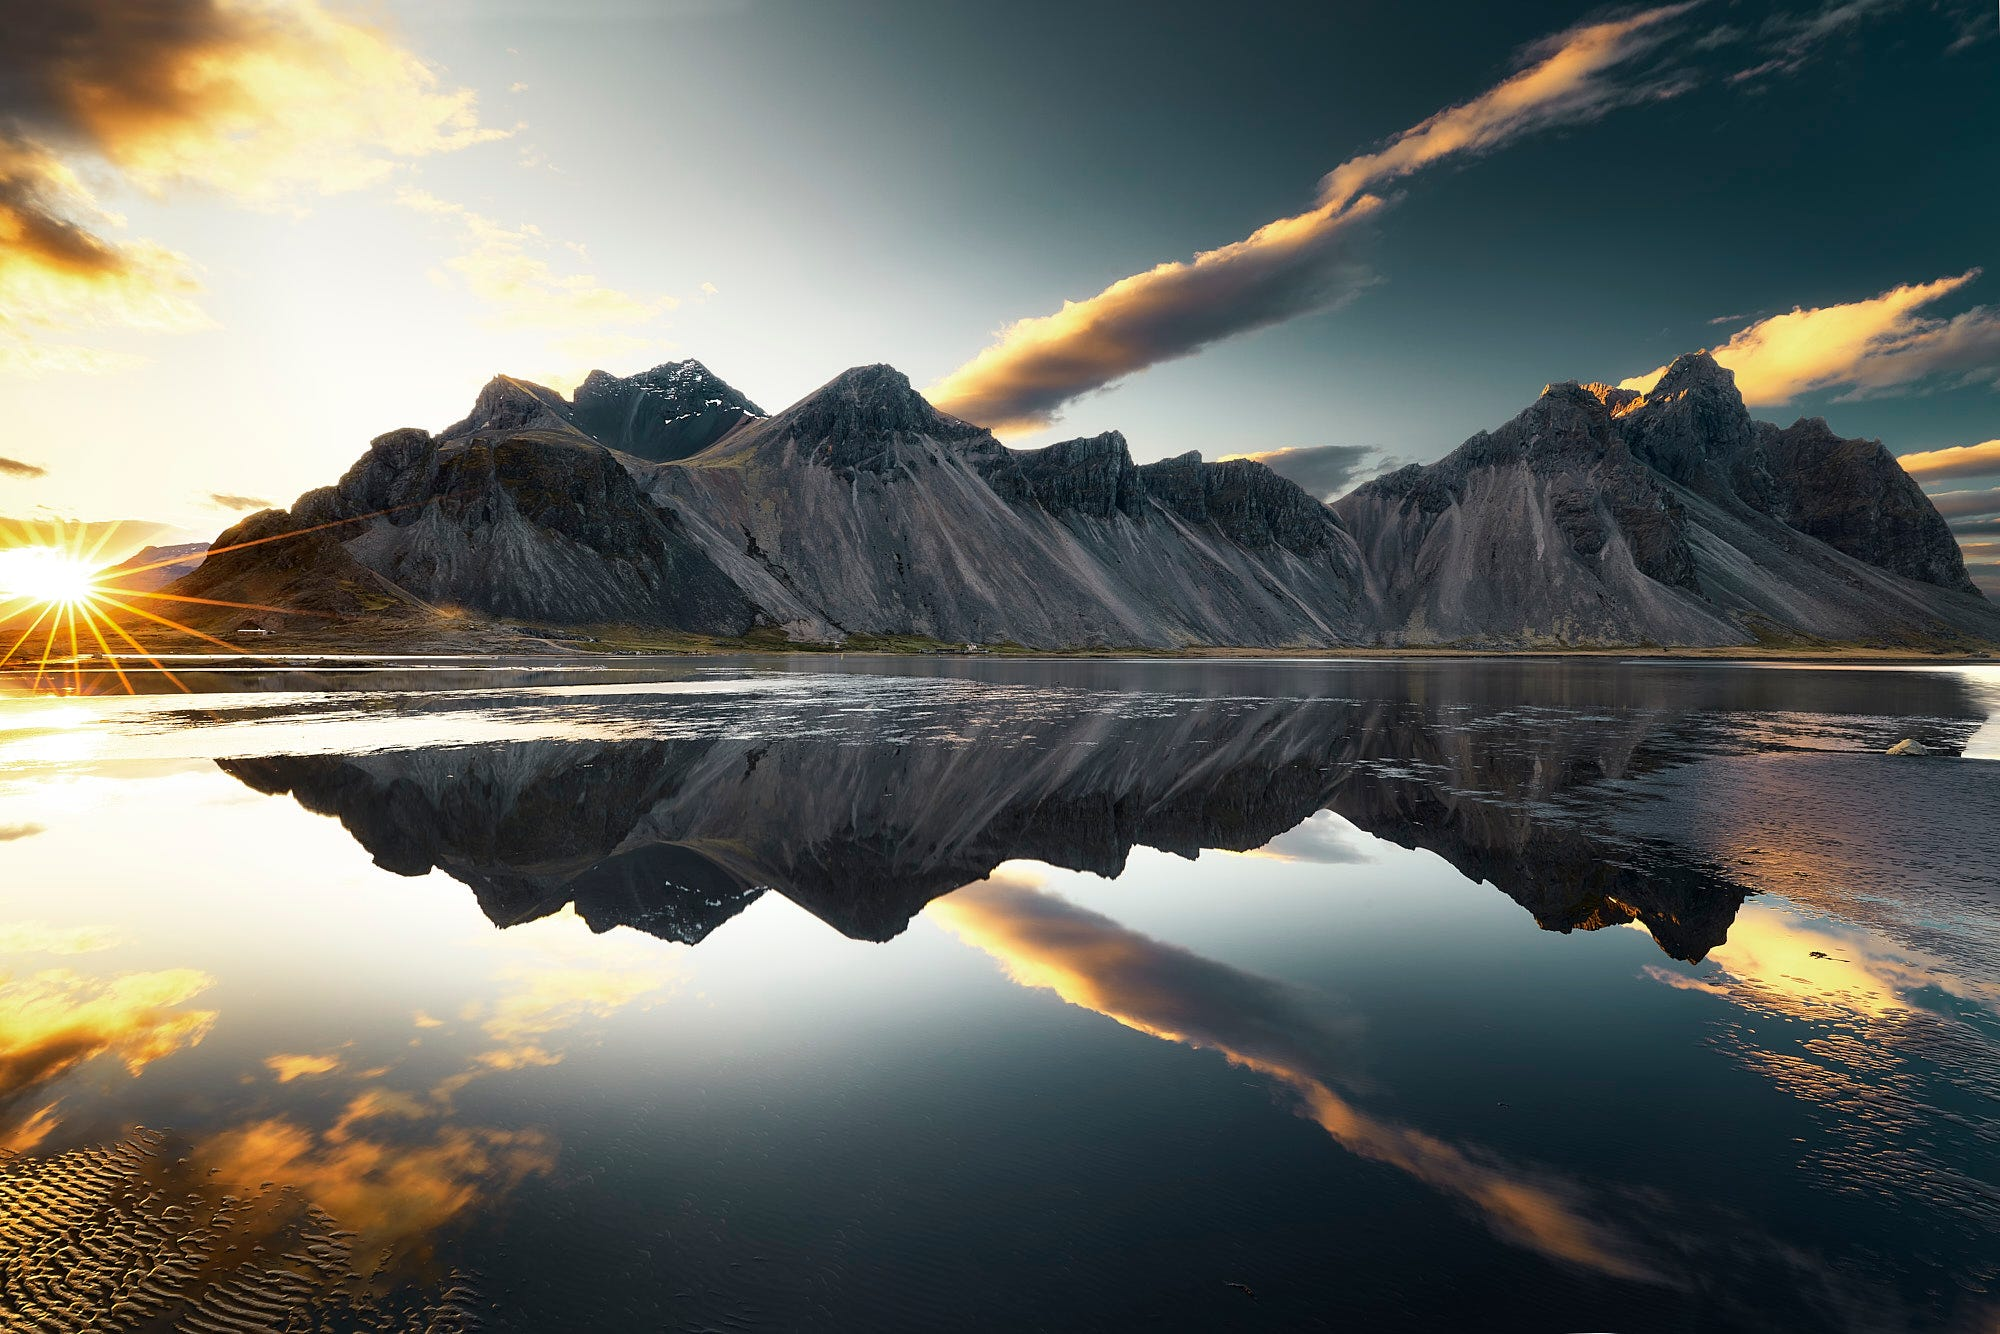 Mountains clouds lake reflection sun sky hd nature 4k - Hp wallpaper nature ...